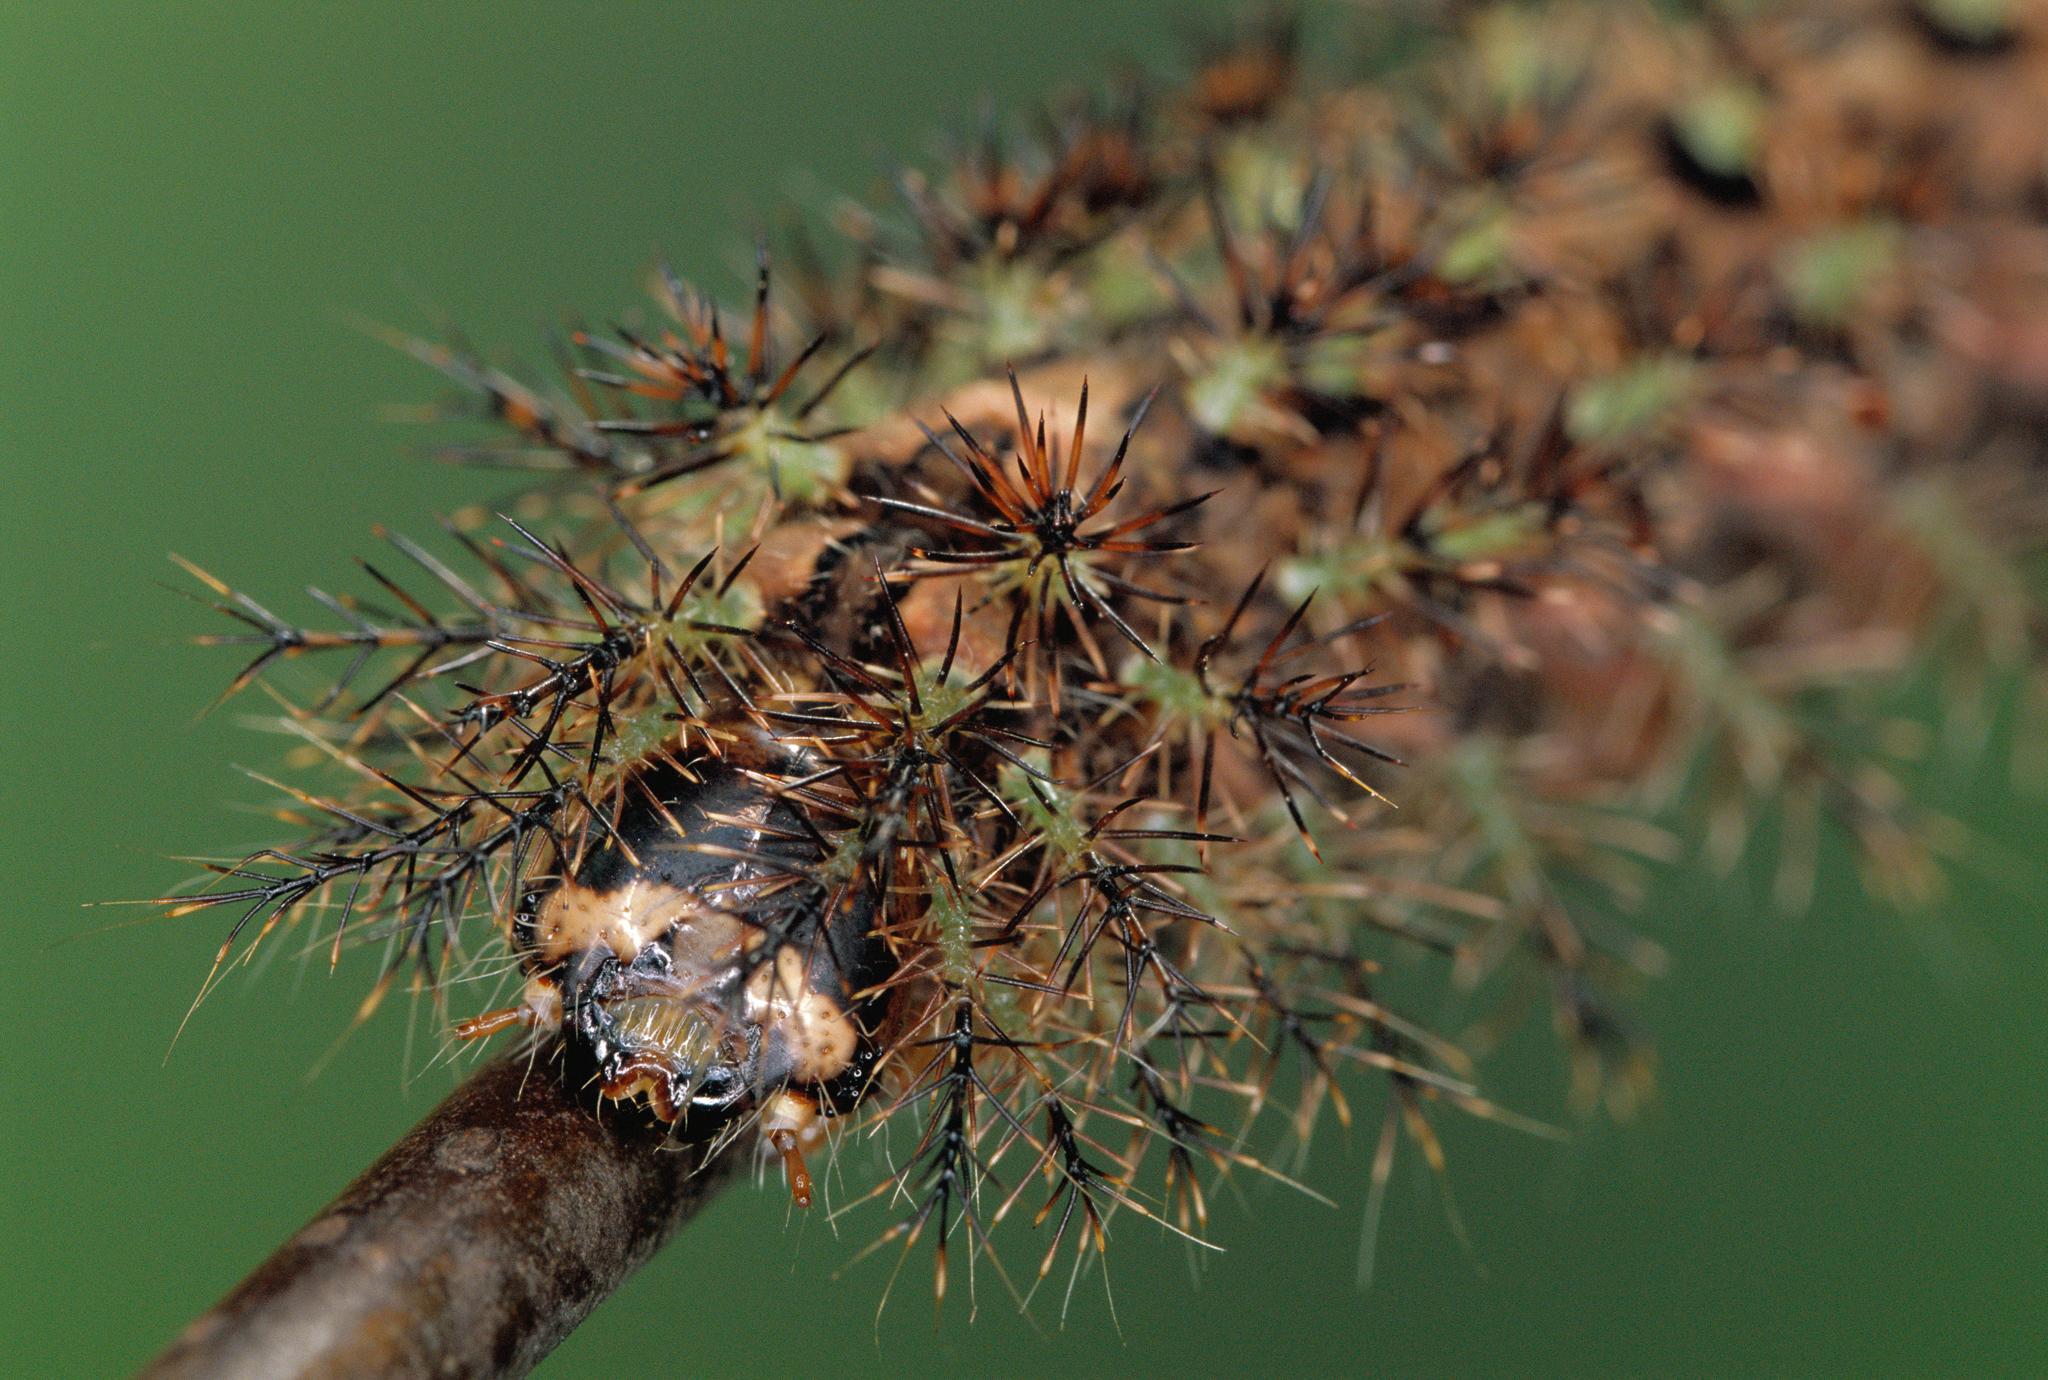 A giant silkworm moth caterpillar (<em>Lonomia cyniva</em>) with spines on display—Photo by Ingo Arndt